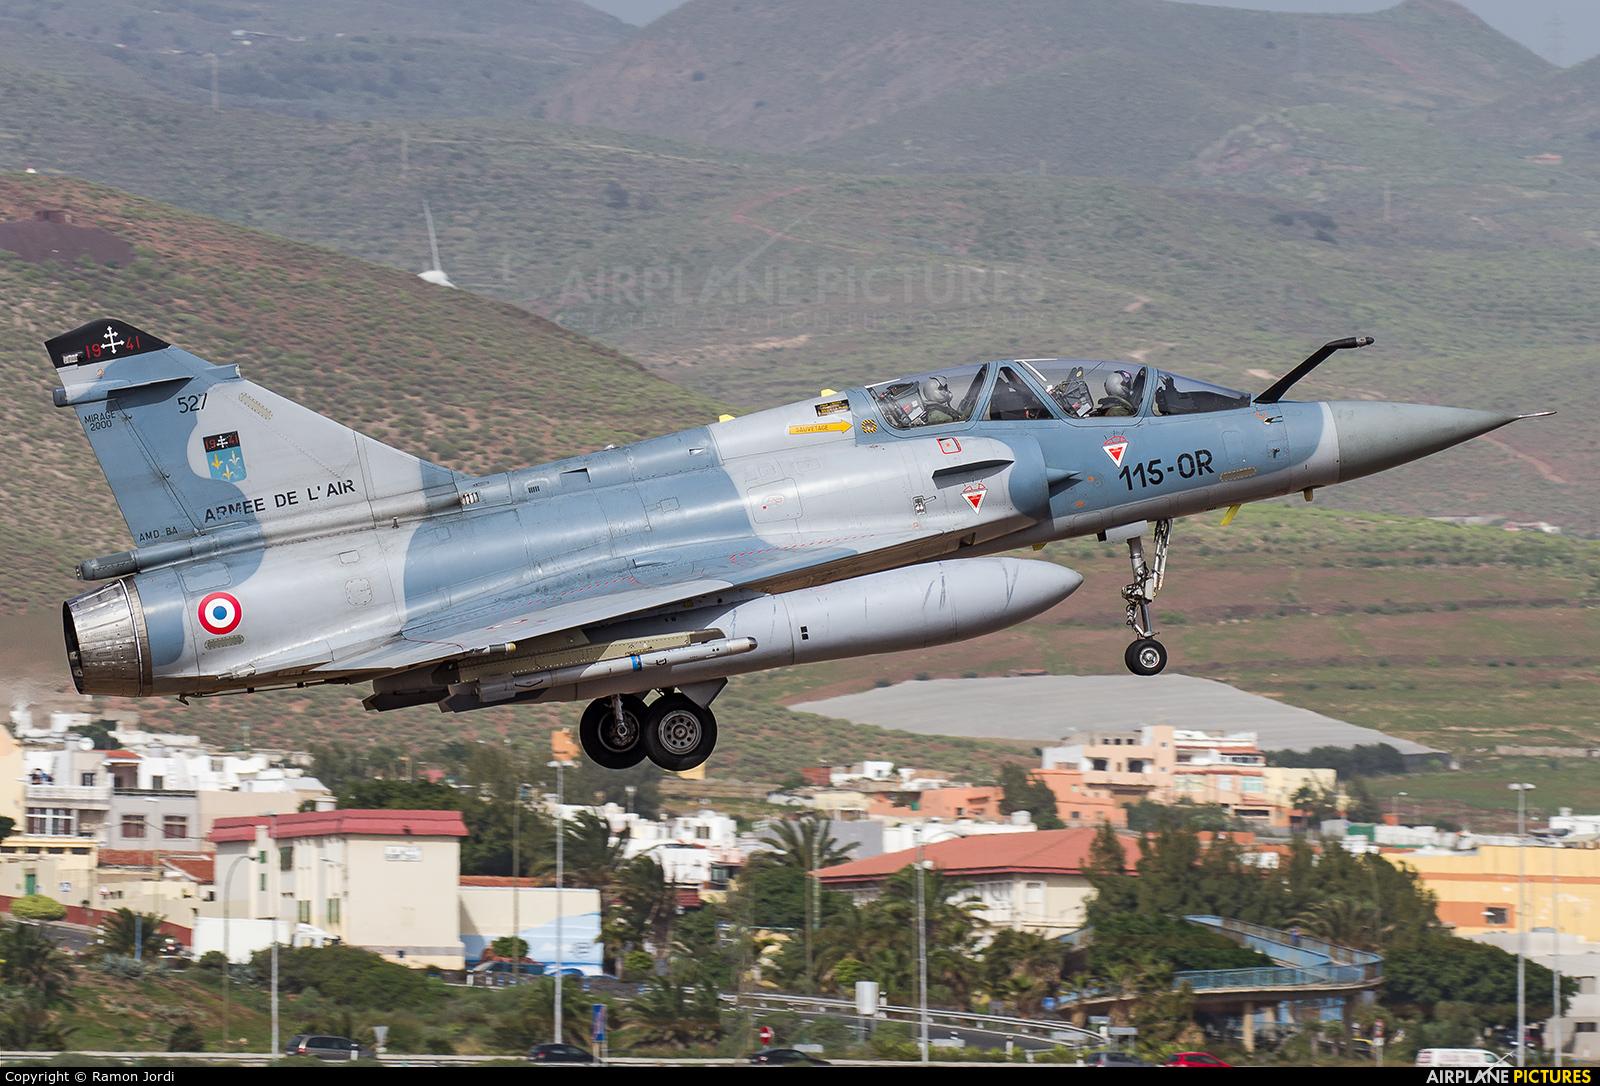 France - Air Force 527 aircraft at Las Palmas de Gran Canaria